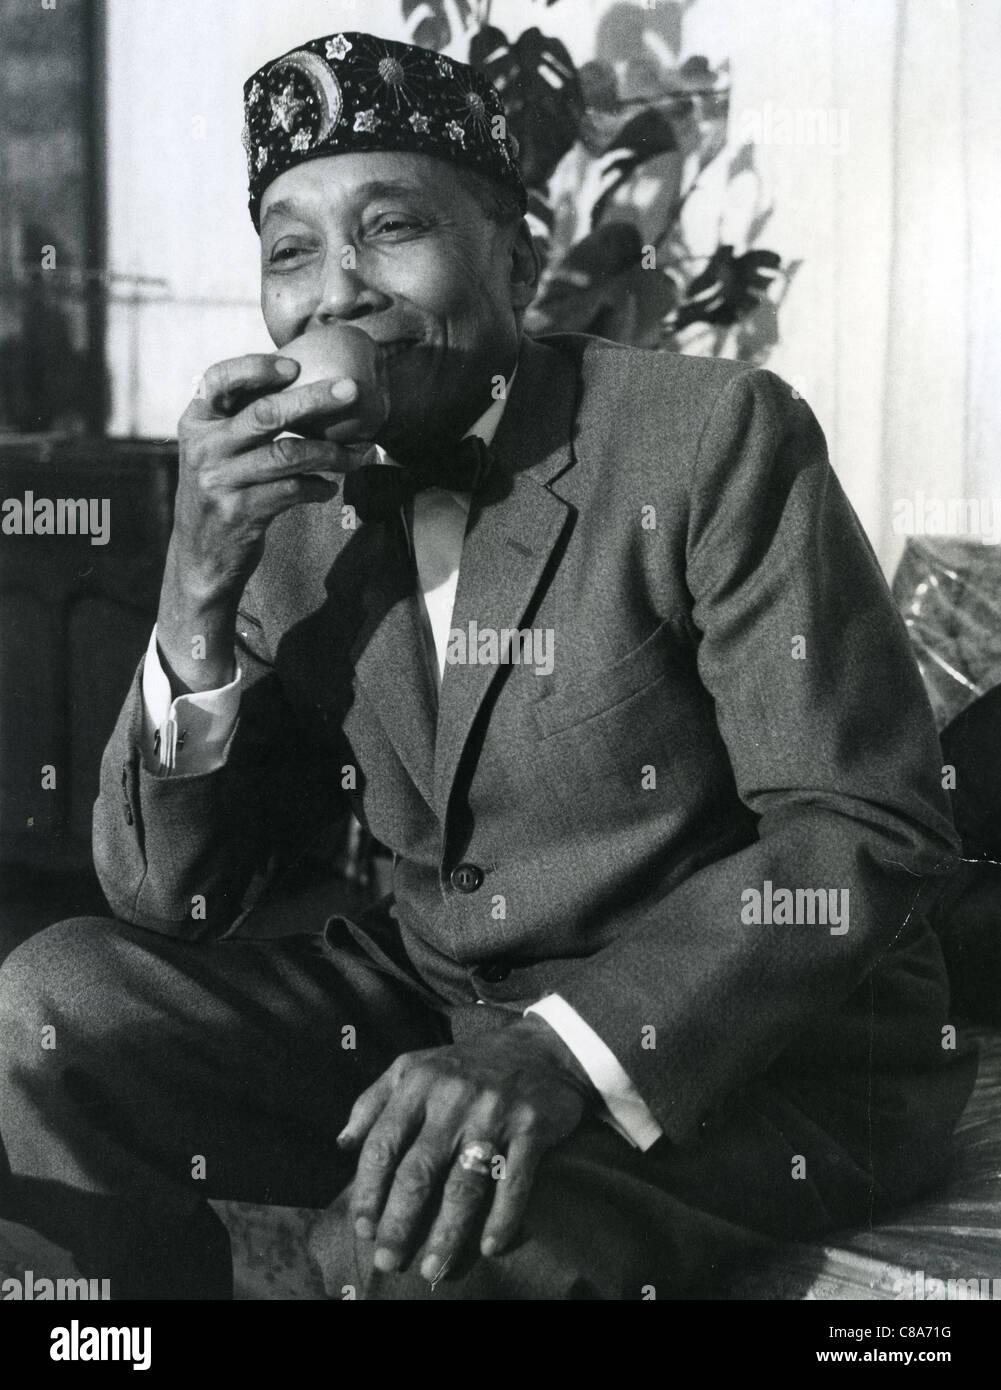 ELIJAH MUHAMMAD (1897 ? 1975) afrikanische amerikanische Führer der Nation of Islam. Foto Robert Lucas Stockbild